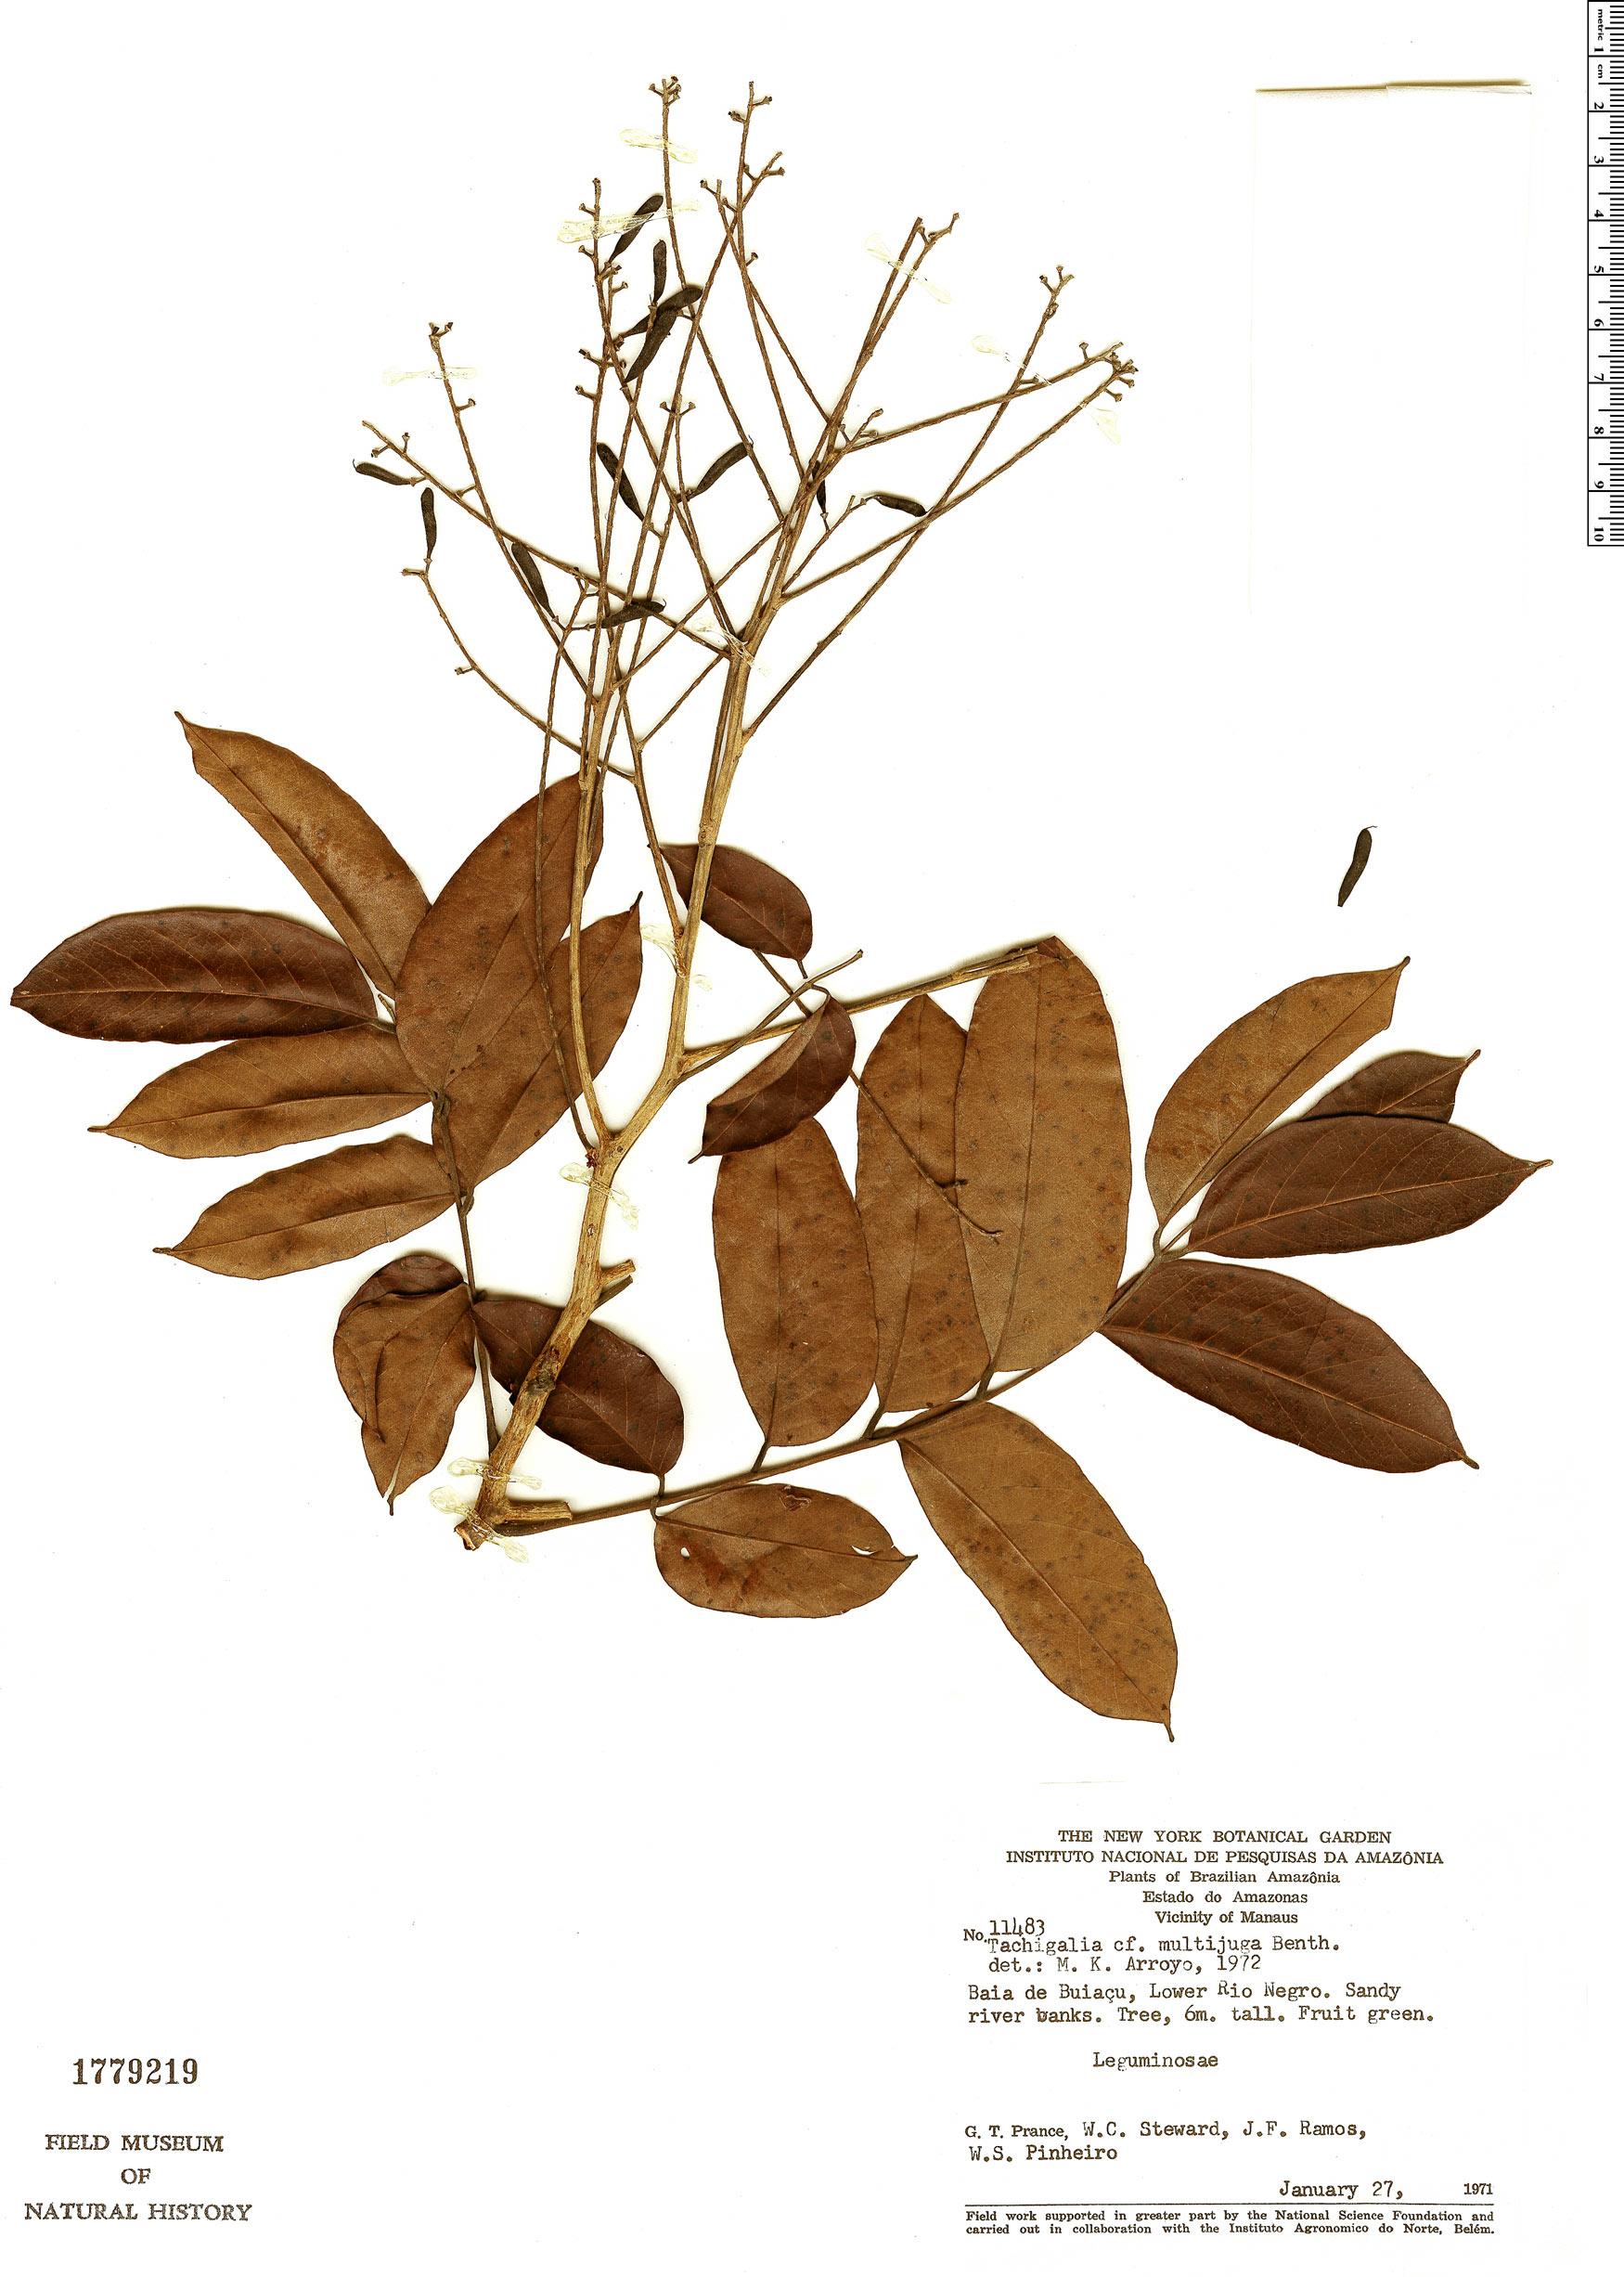 Specimen: Tachigali vulgaris